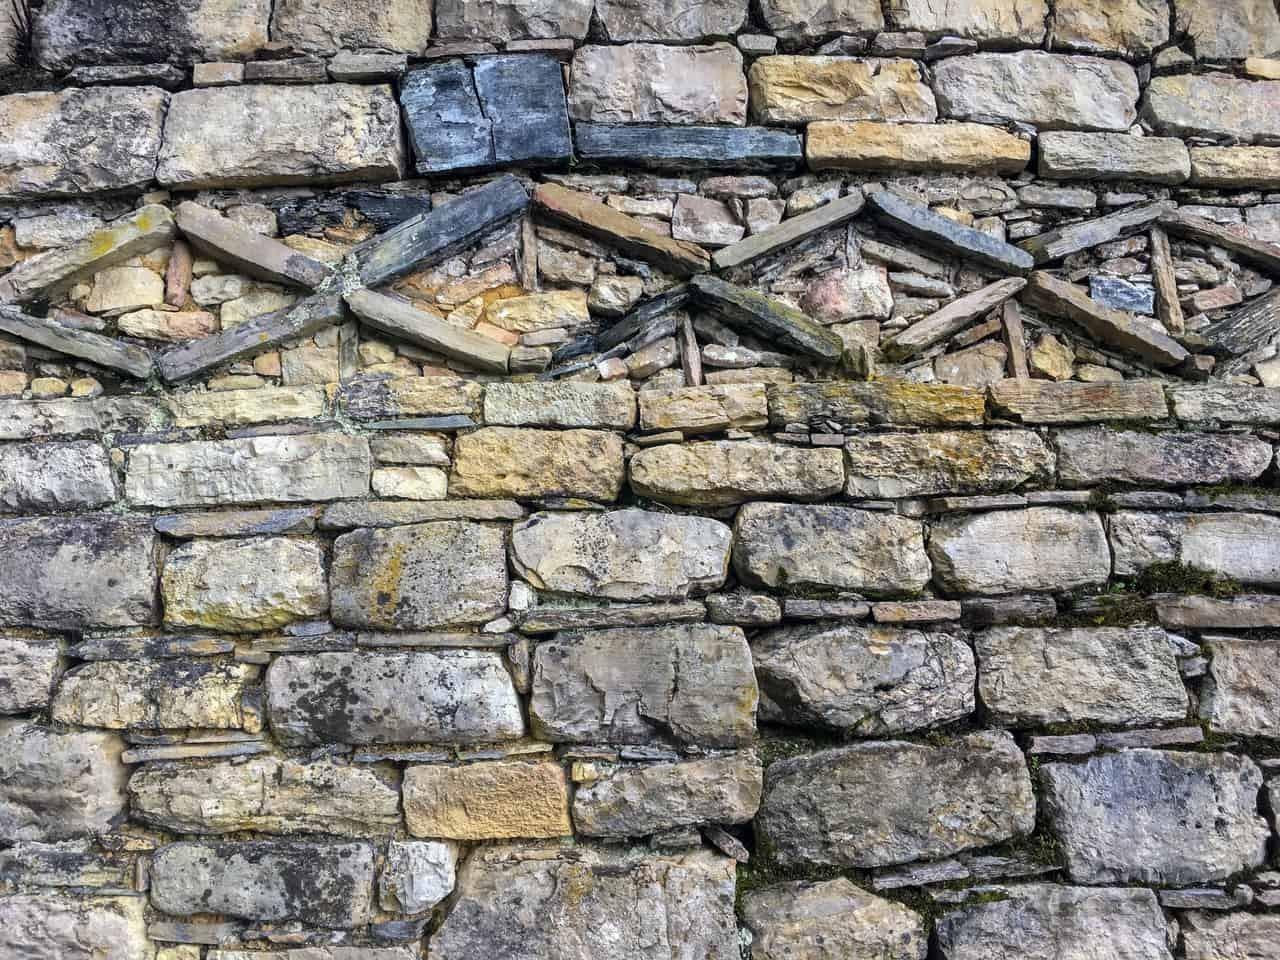 Stone walls designed with geometric shapes. Kuelap, Peru.